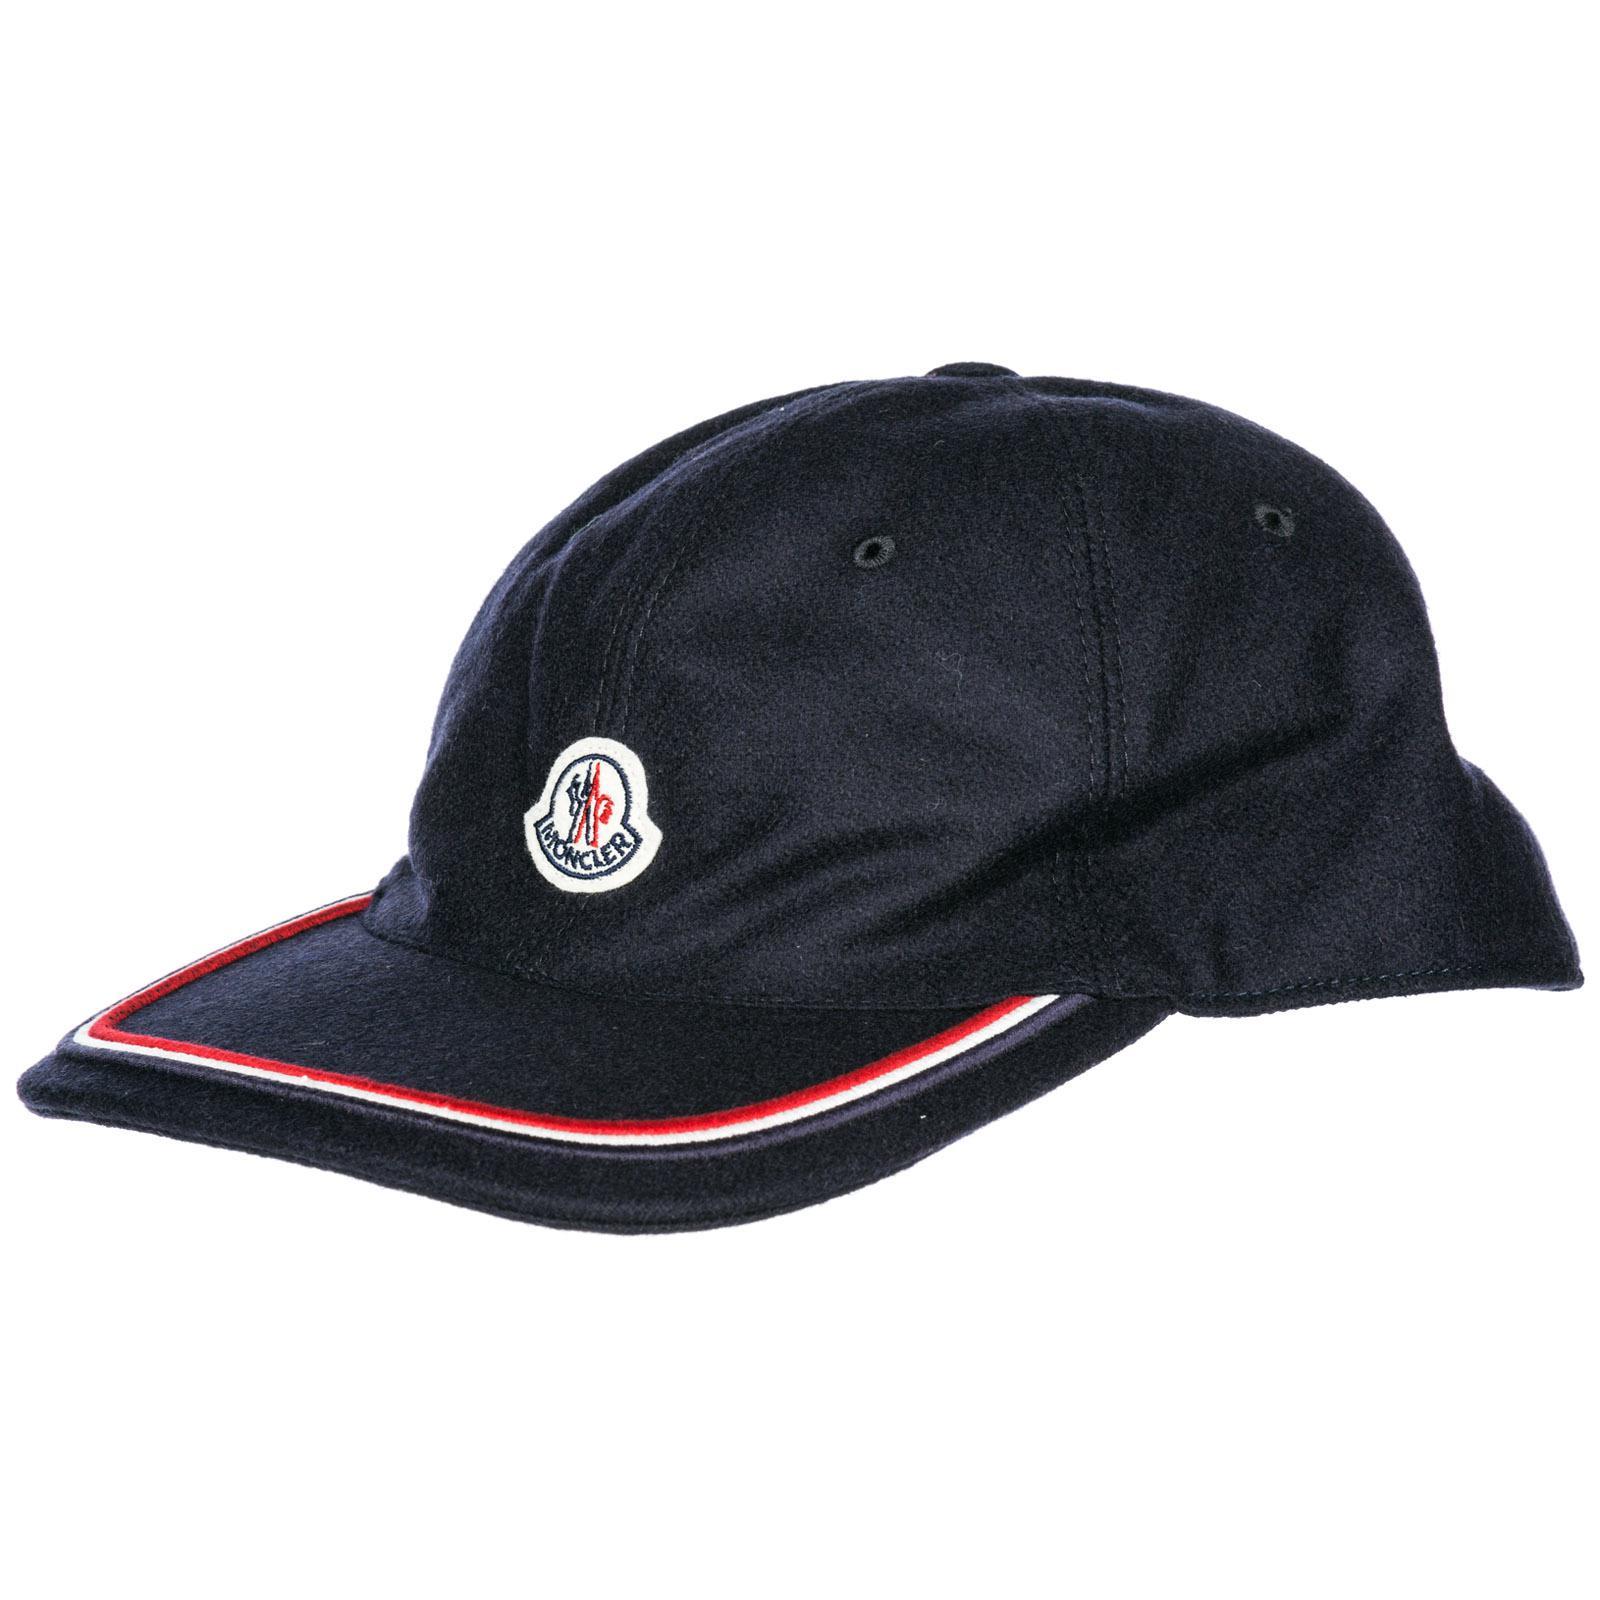 Lyst - Moncler Adjustable Cotton Hat Baseball Cap in Blue for Men ... 407ac56e0df2